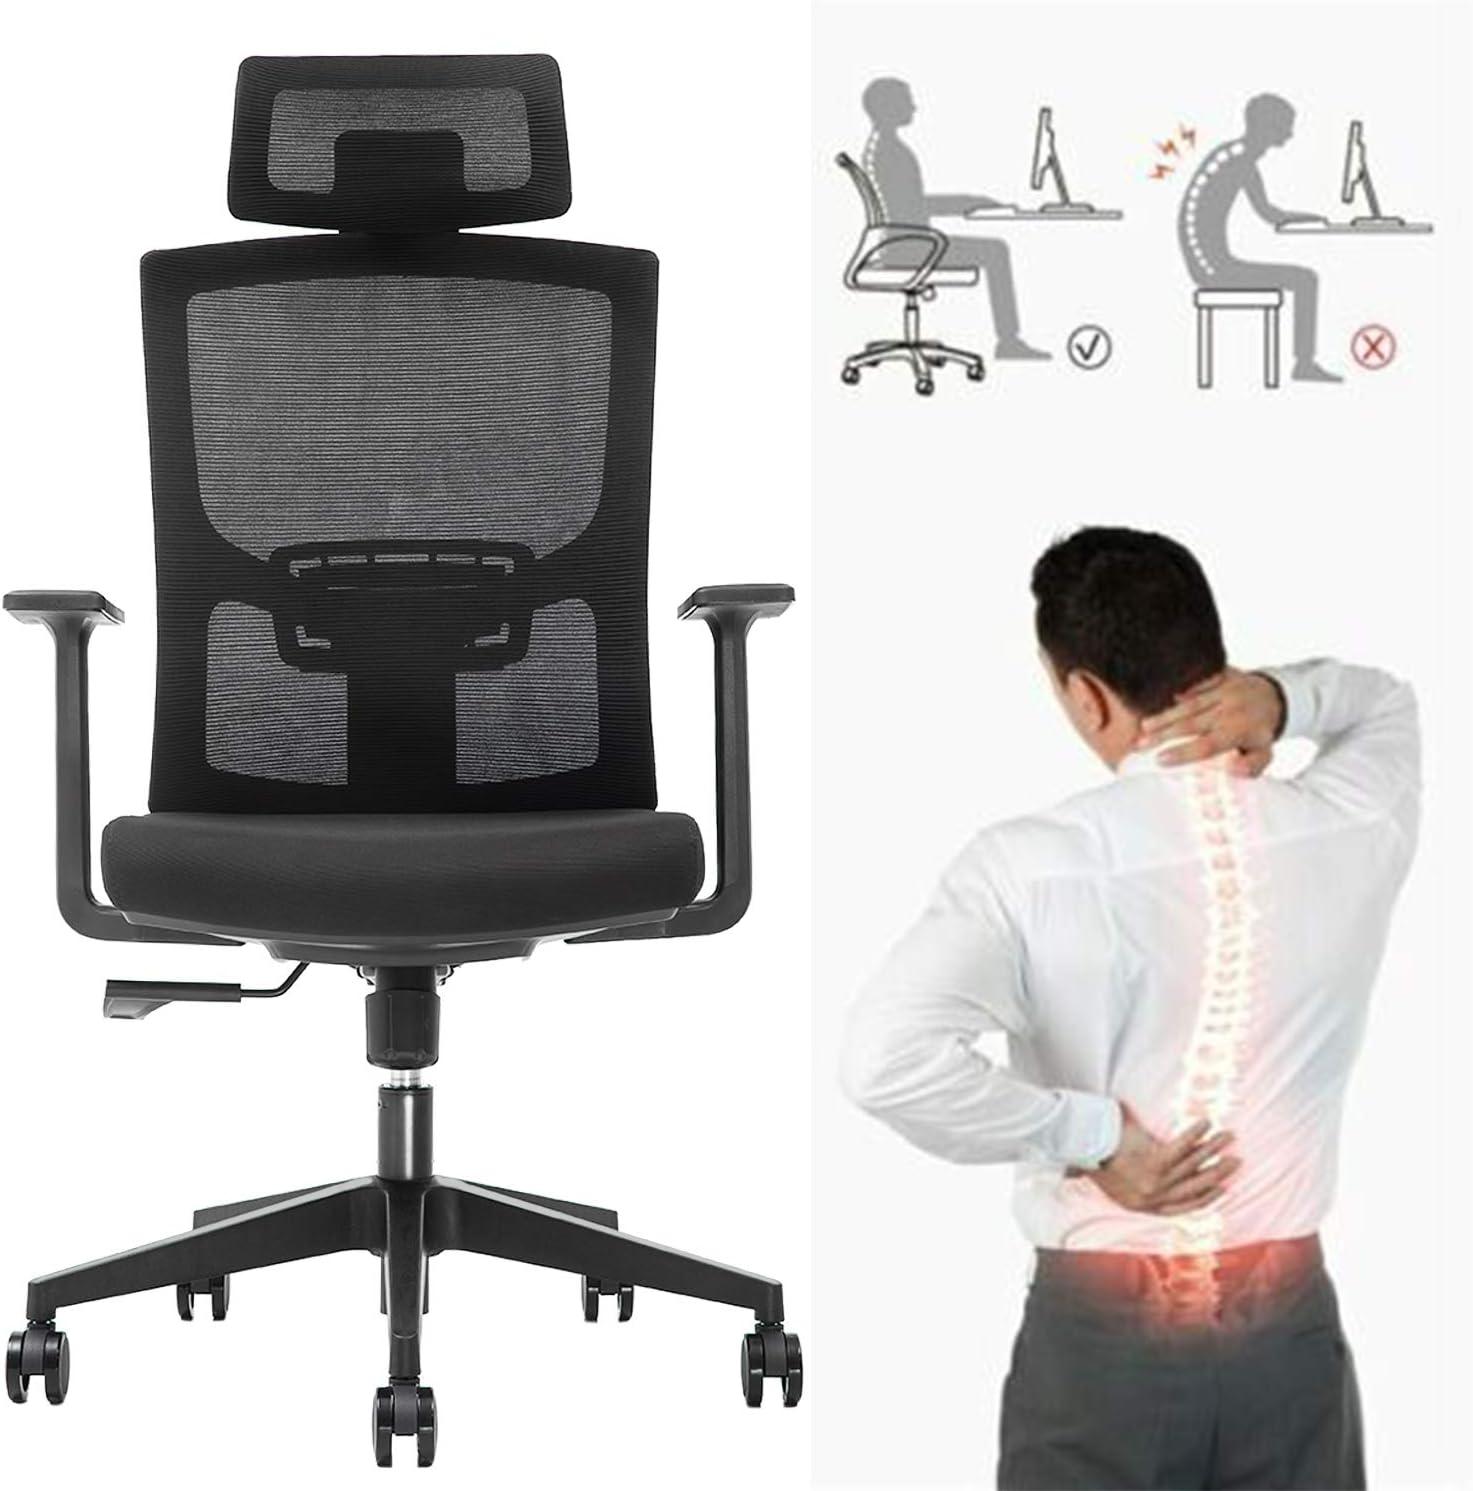 Ergonomic Adjustable Office Chair,High Back Home Desk Chair